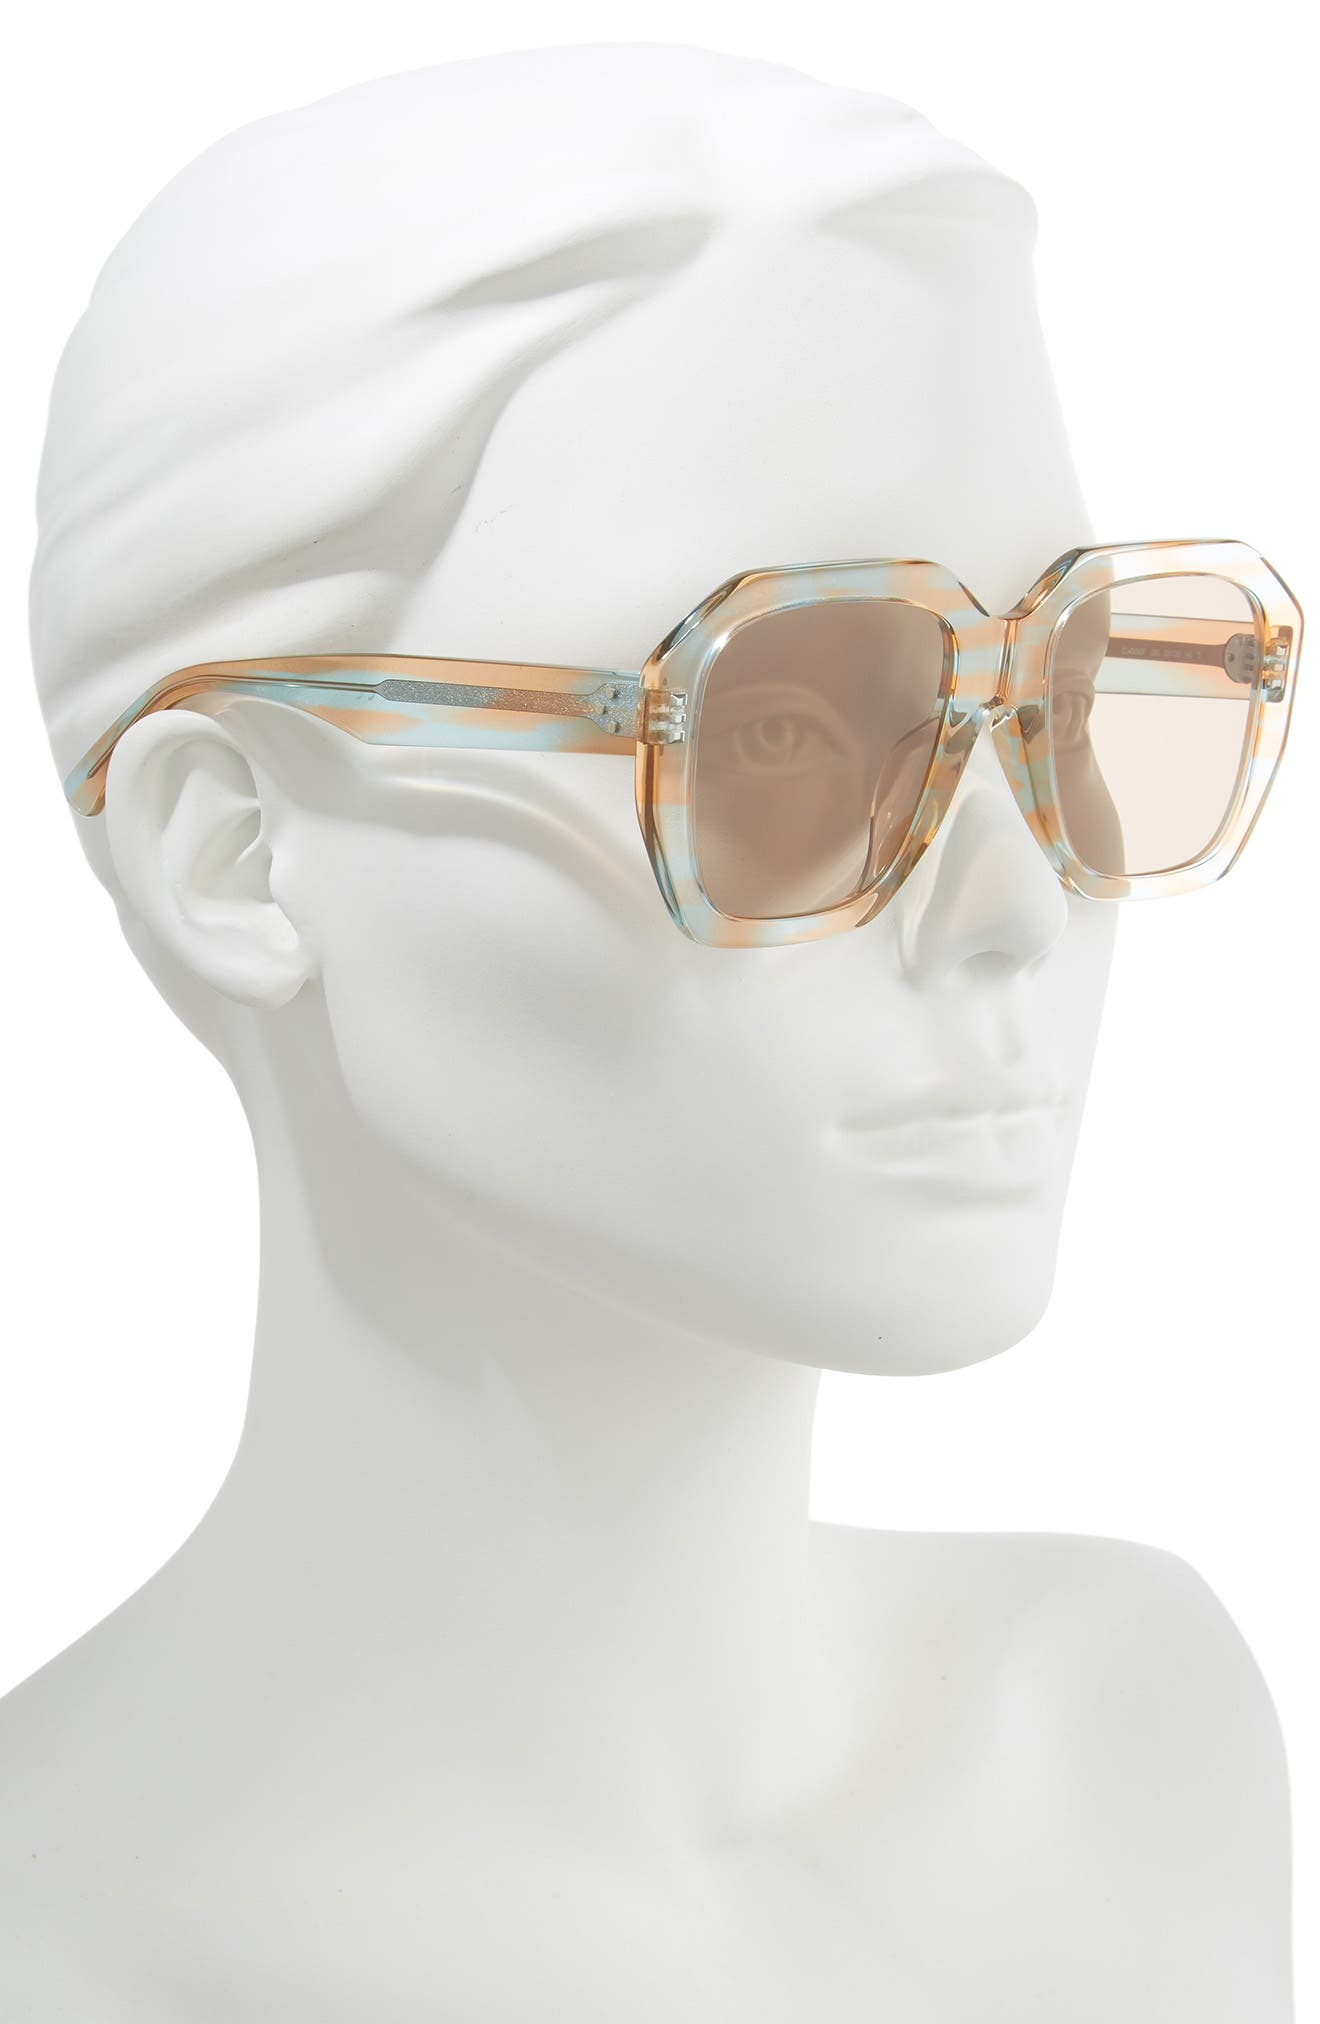 CELINE 53Mm Square Sunglasses - Striped Peach/ Azure Havana